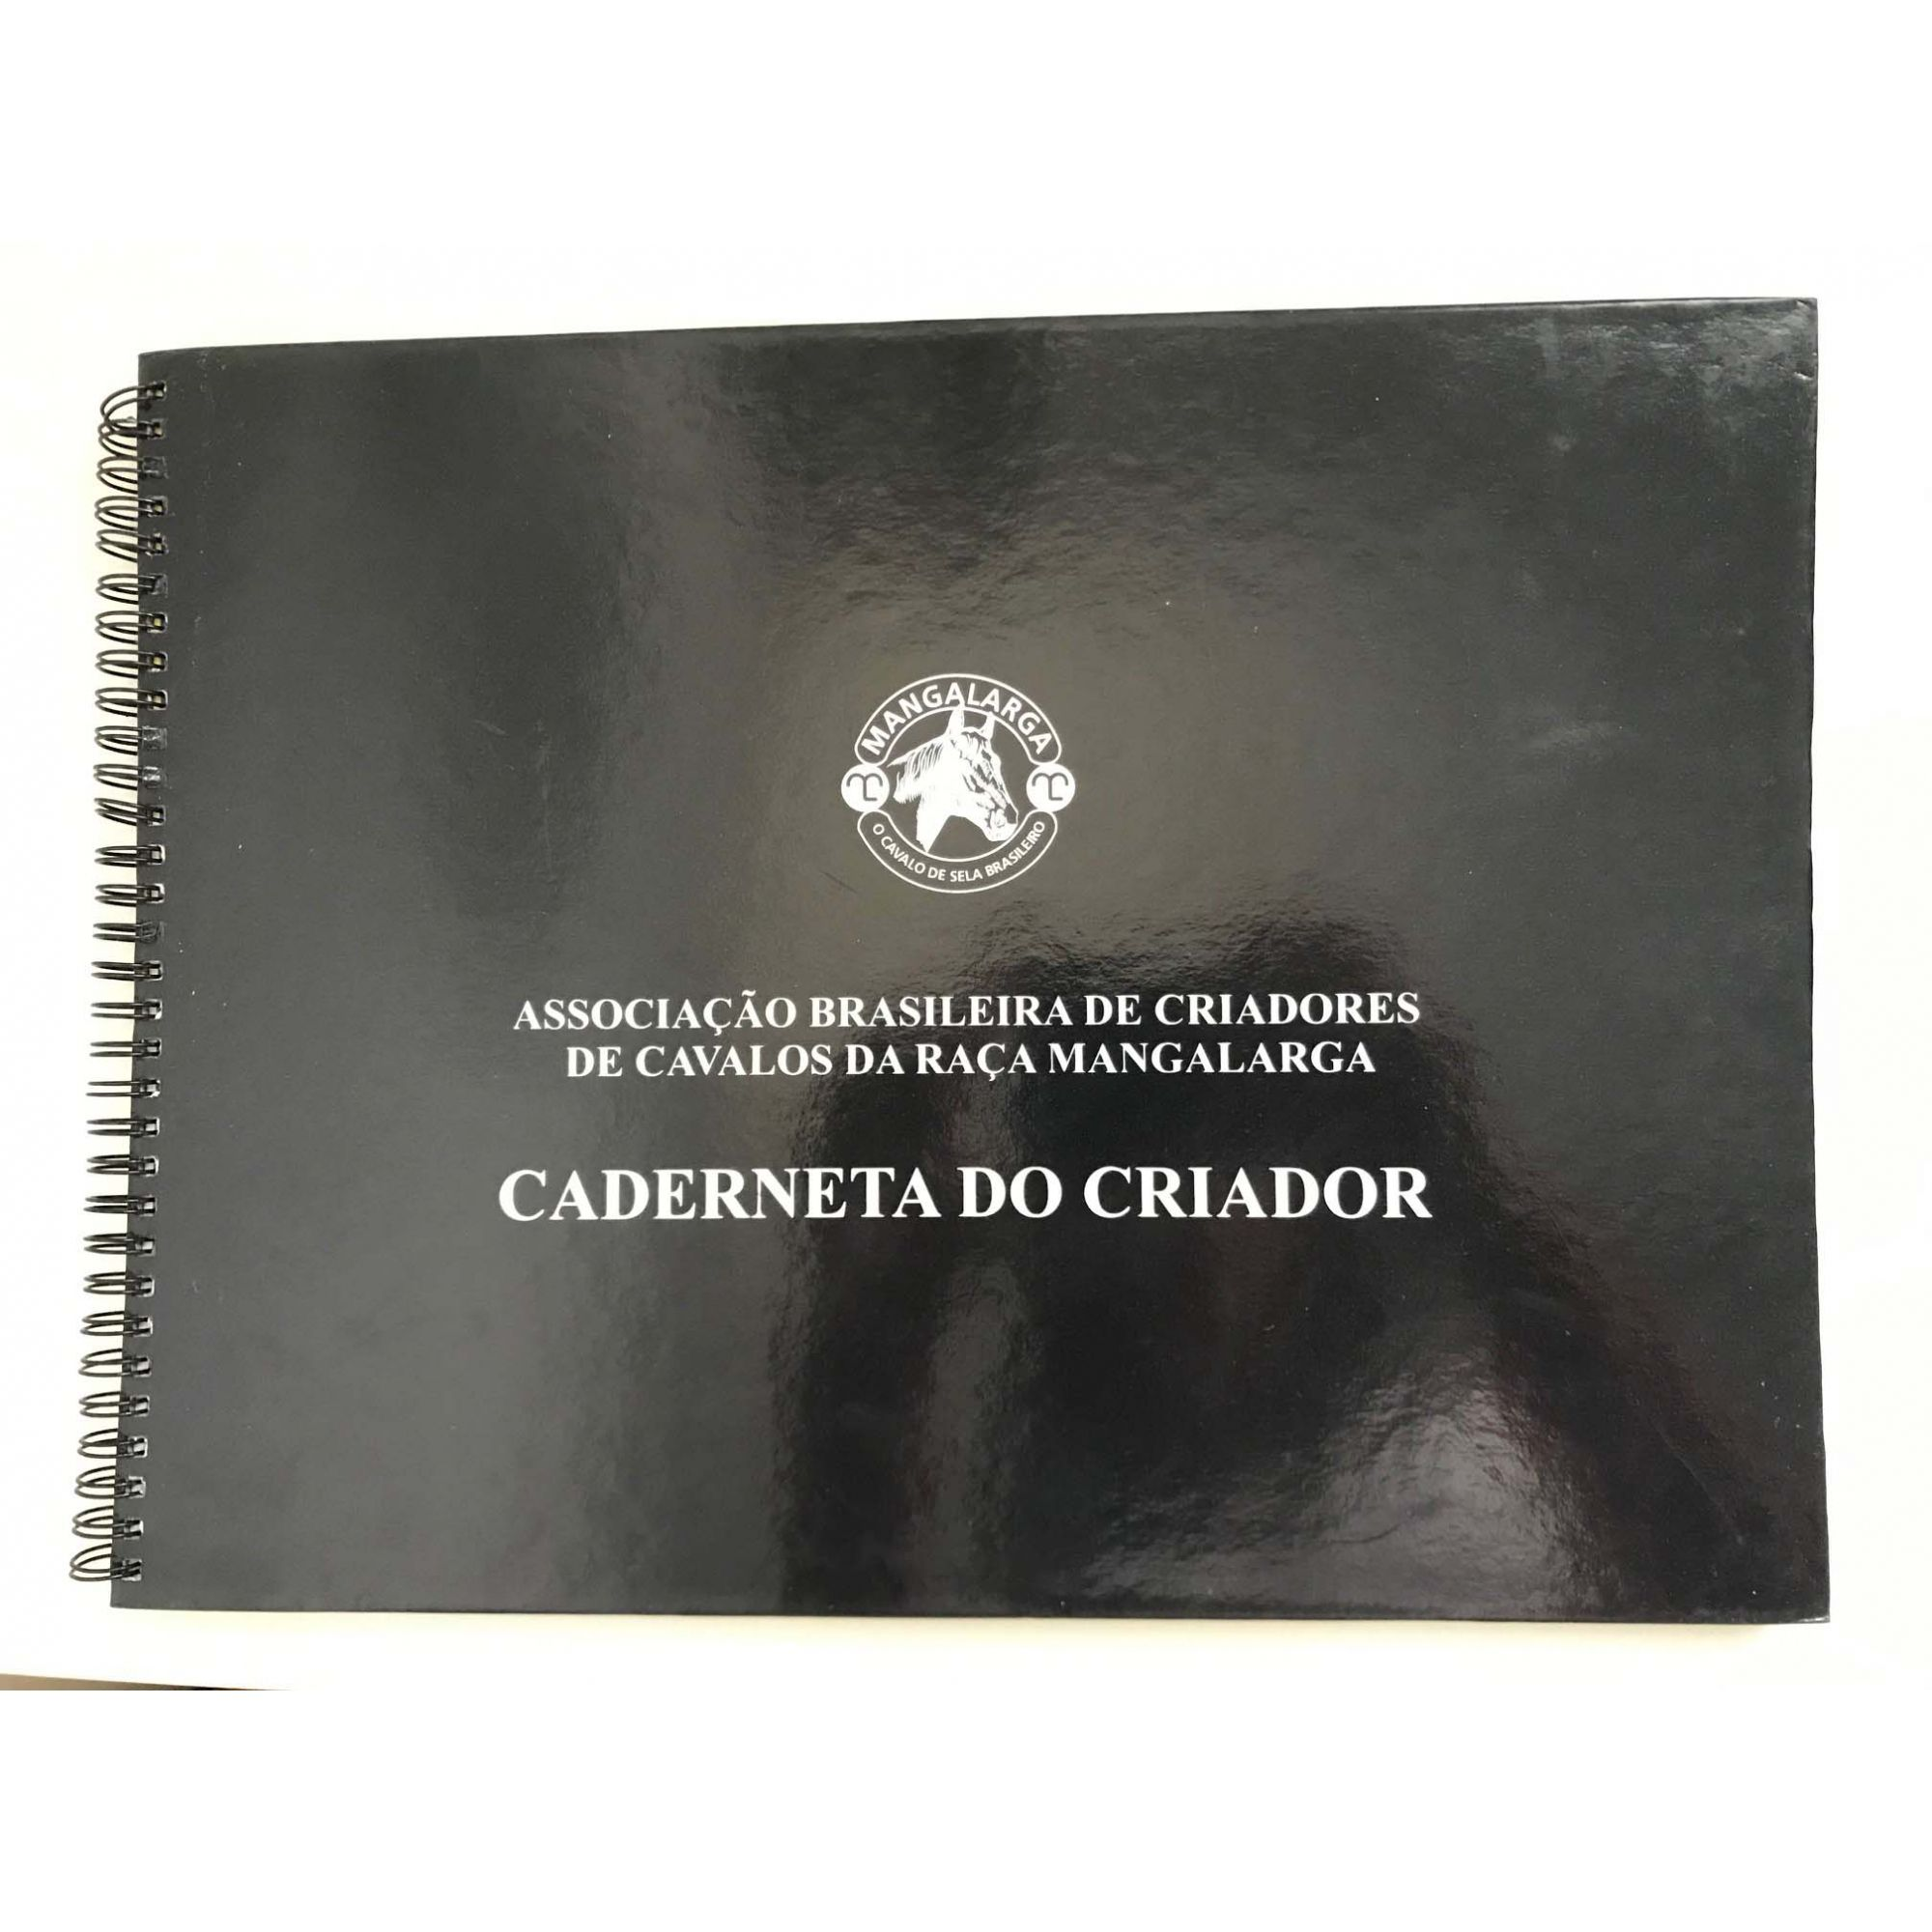 Caderneta do Criador ABCCRM  - Boutique Mangalarga